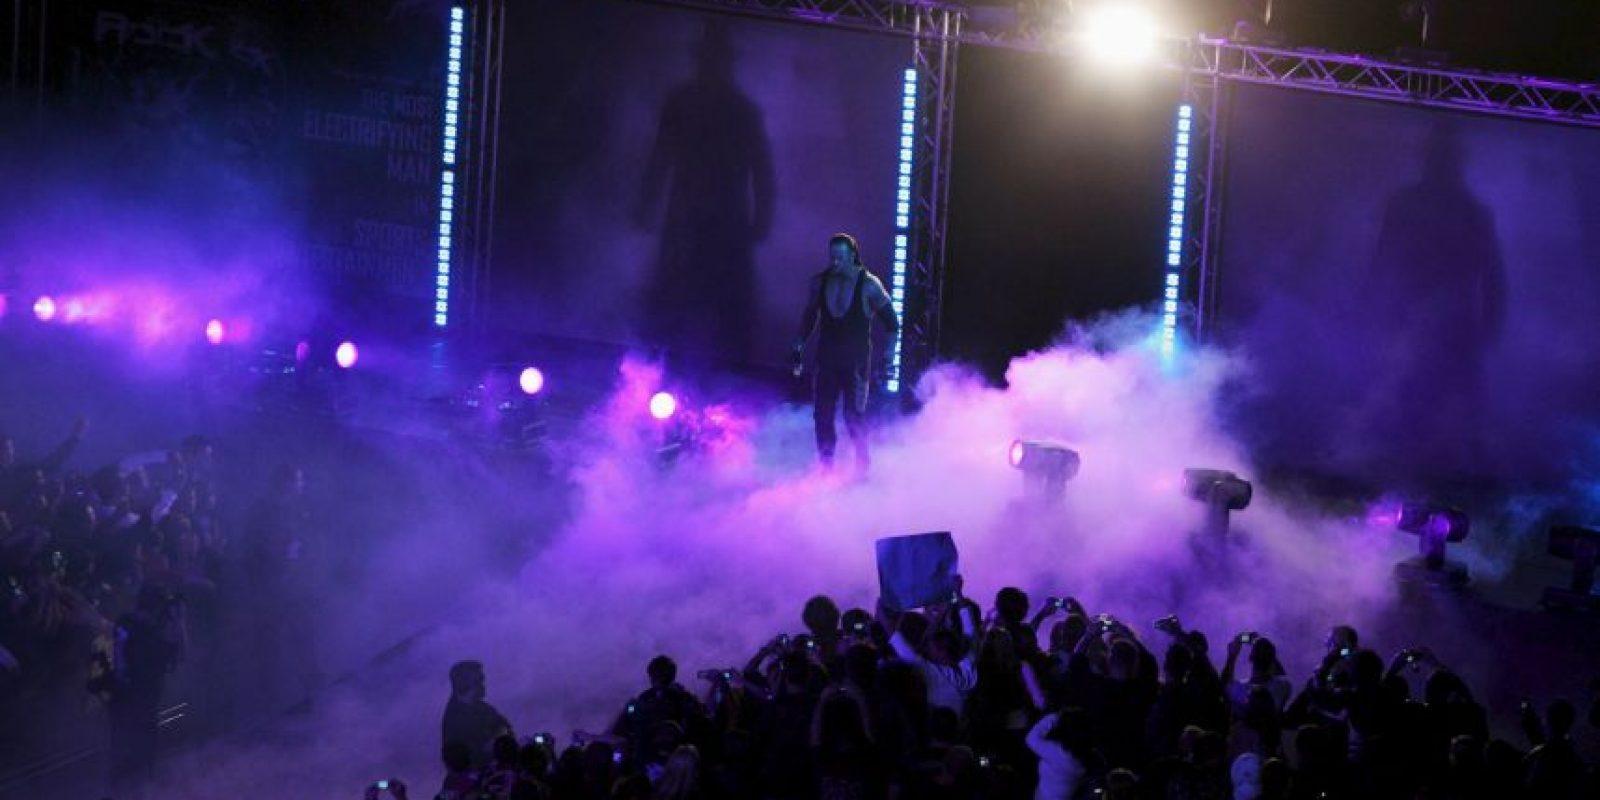 Se espera que Undertaker regrese en Wrestlemania 33